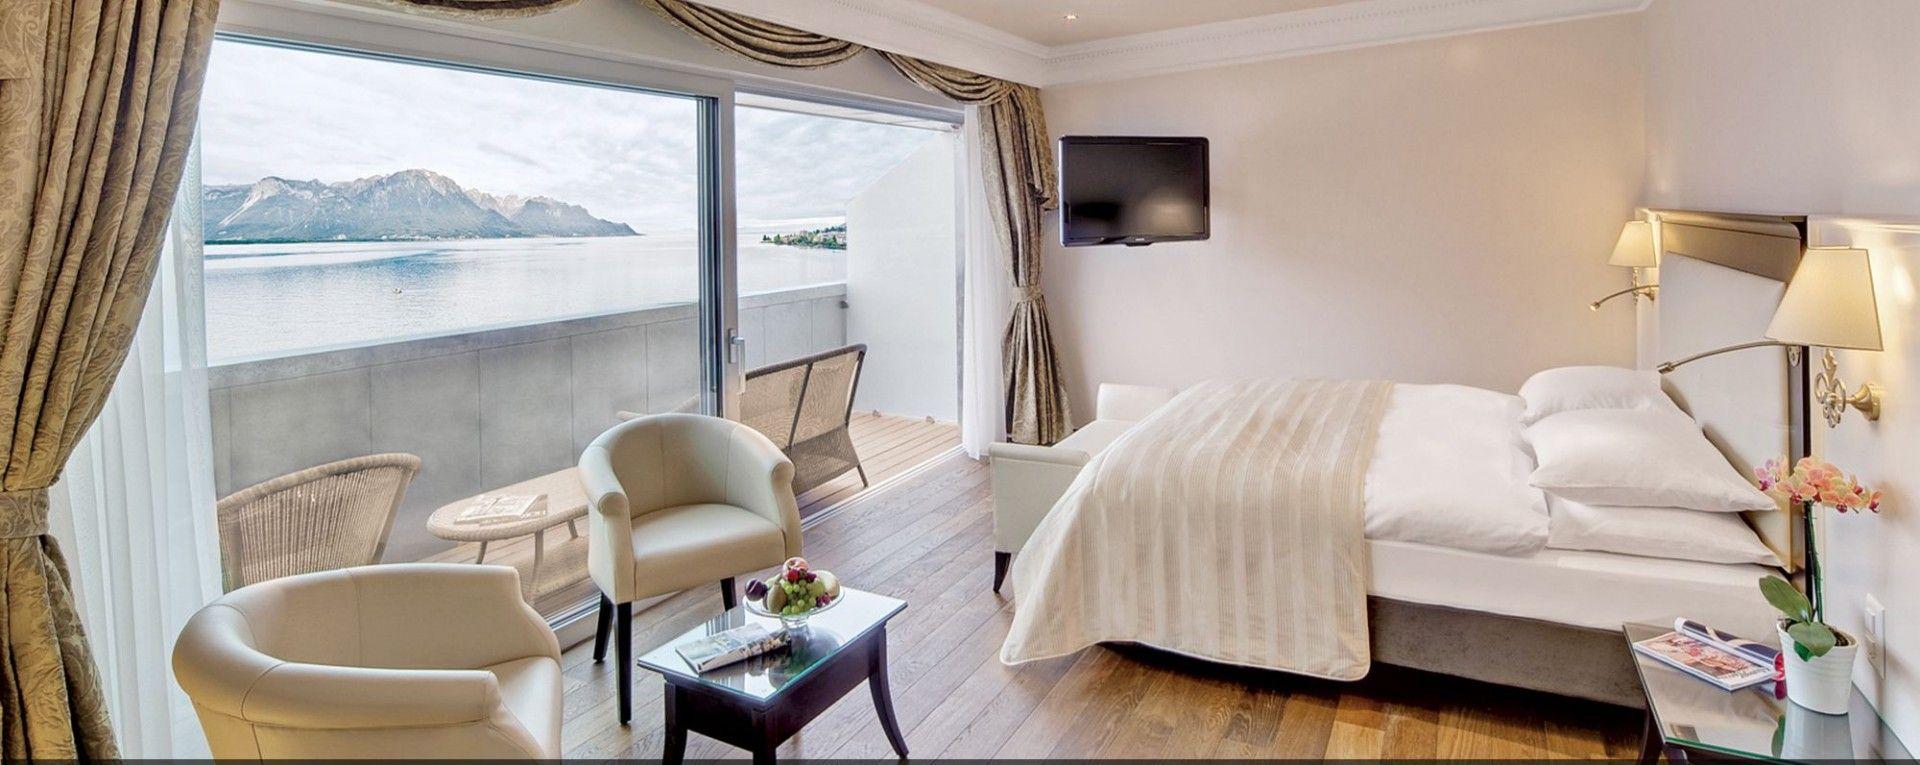 Grand Hotel Suibe Majestic Lake Geneva